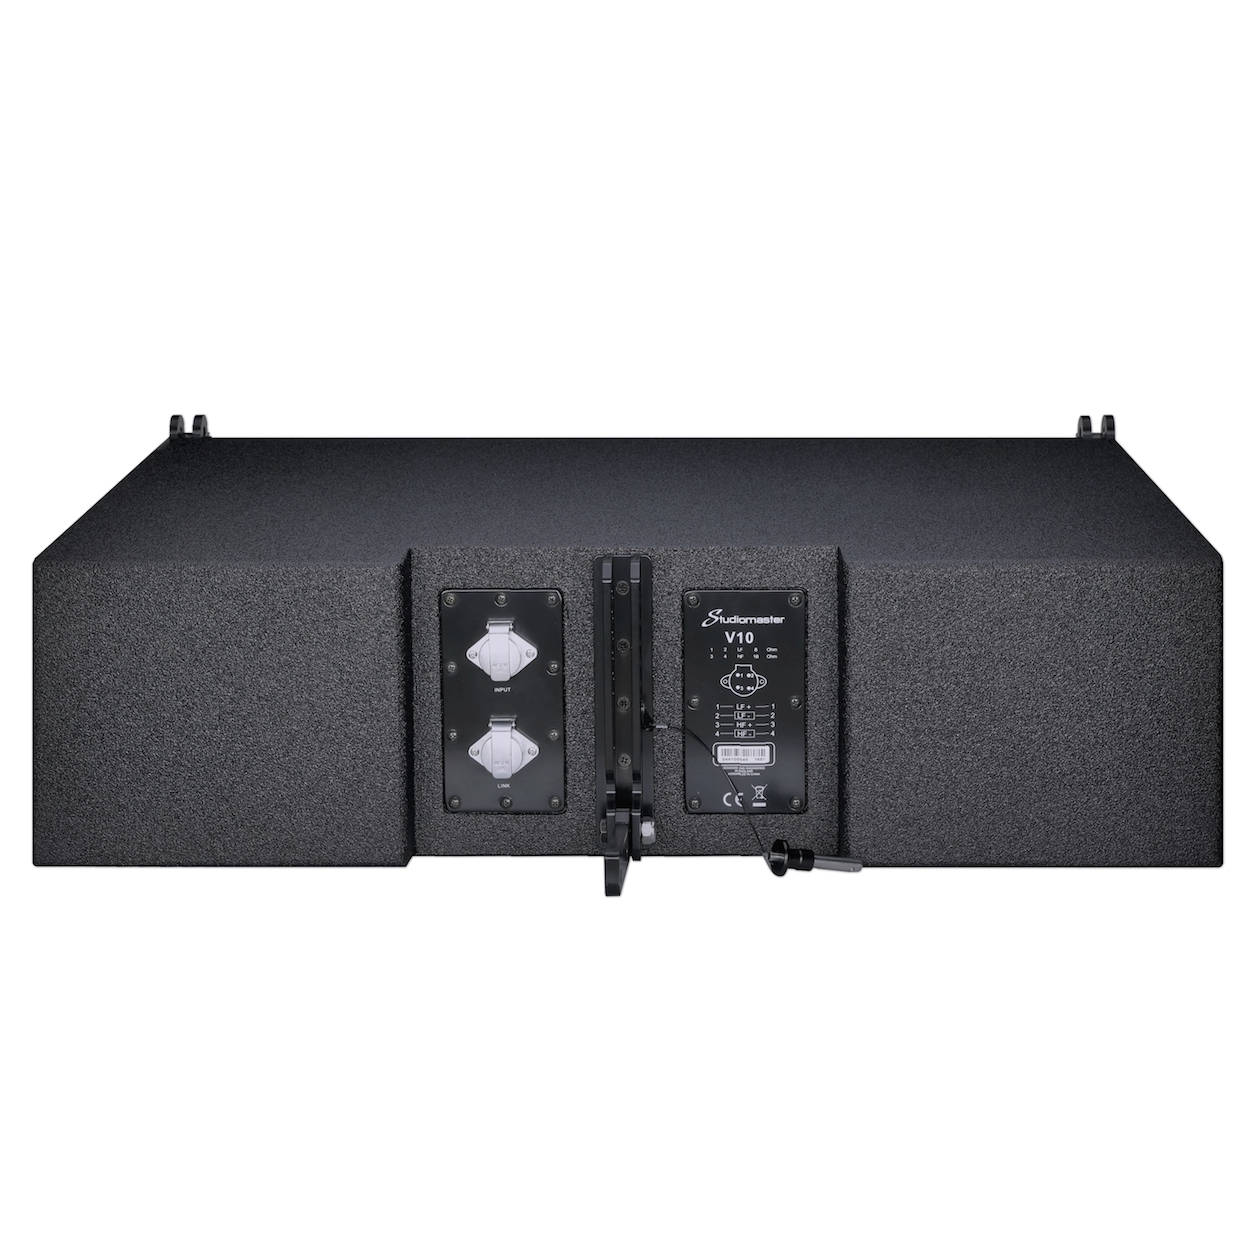 Studiomaster V10 line array rear view